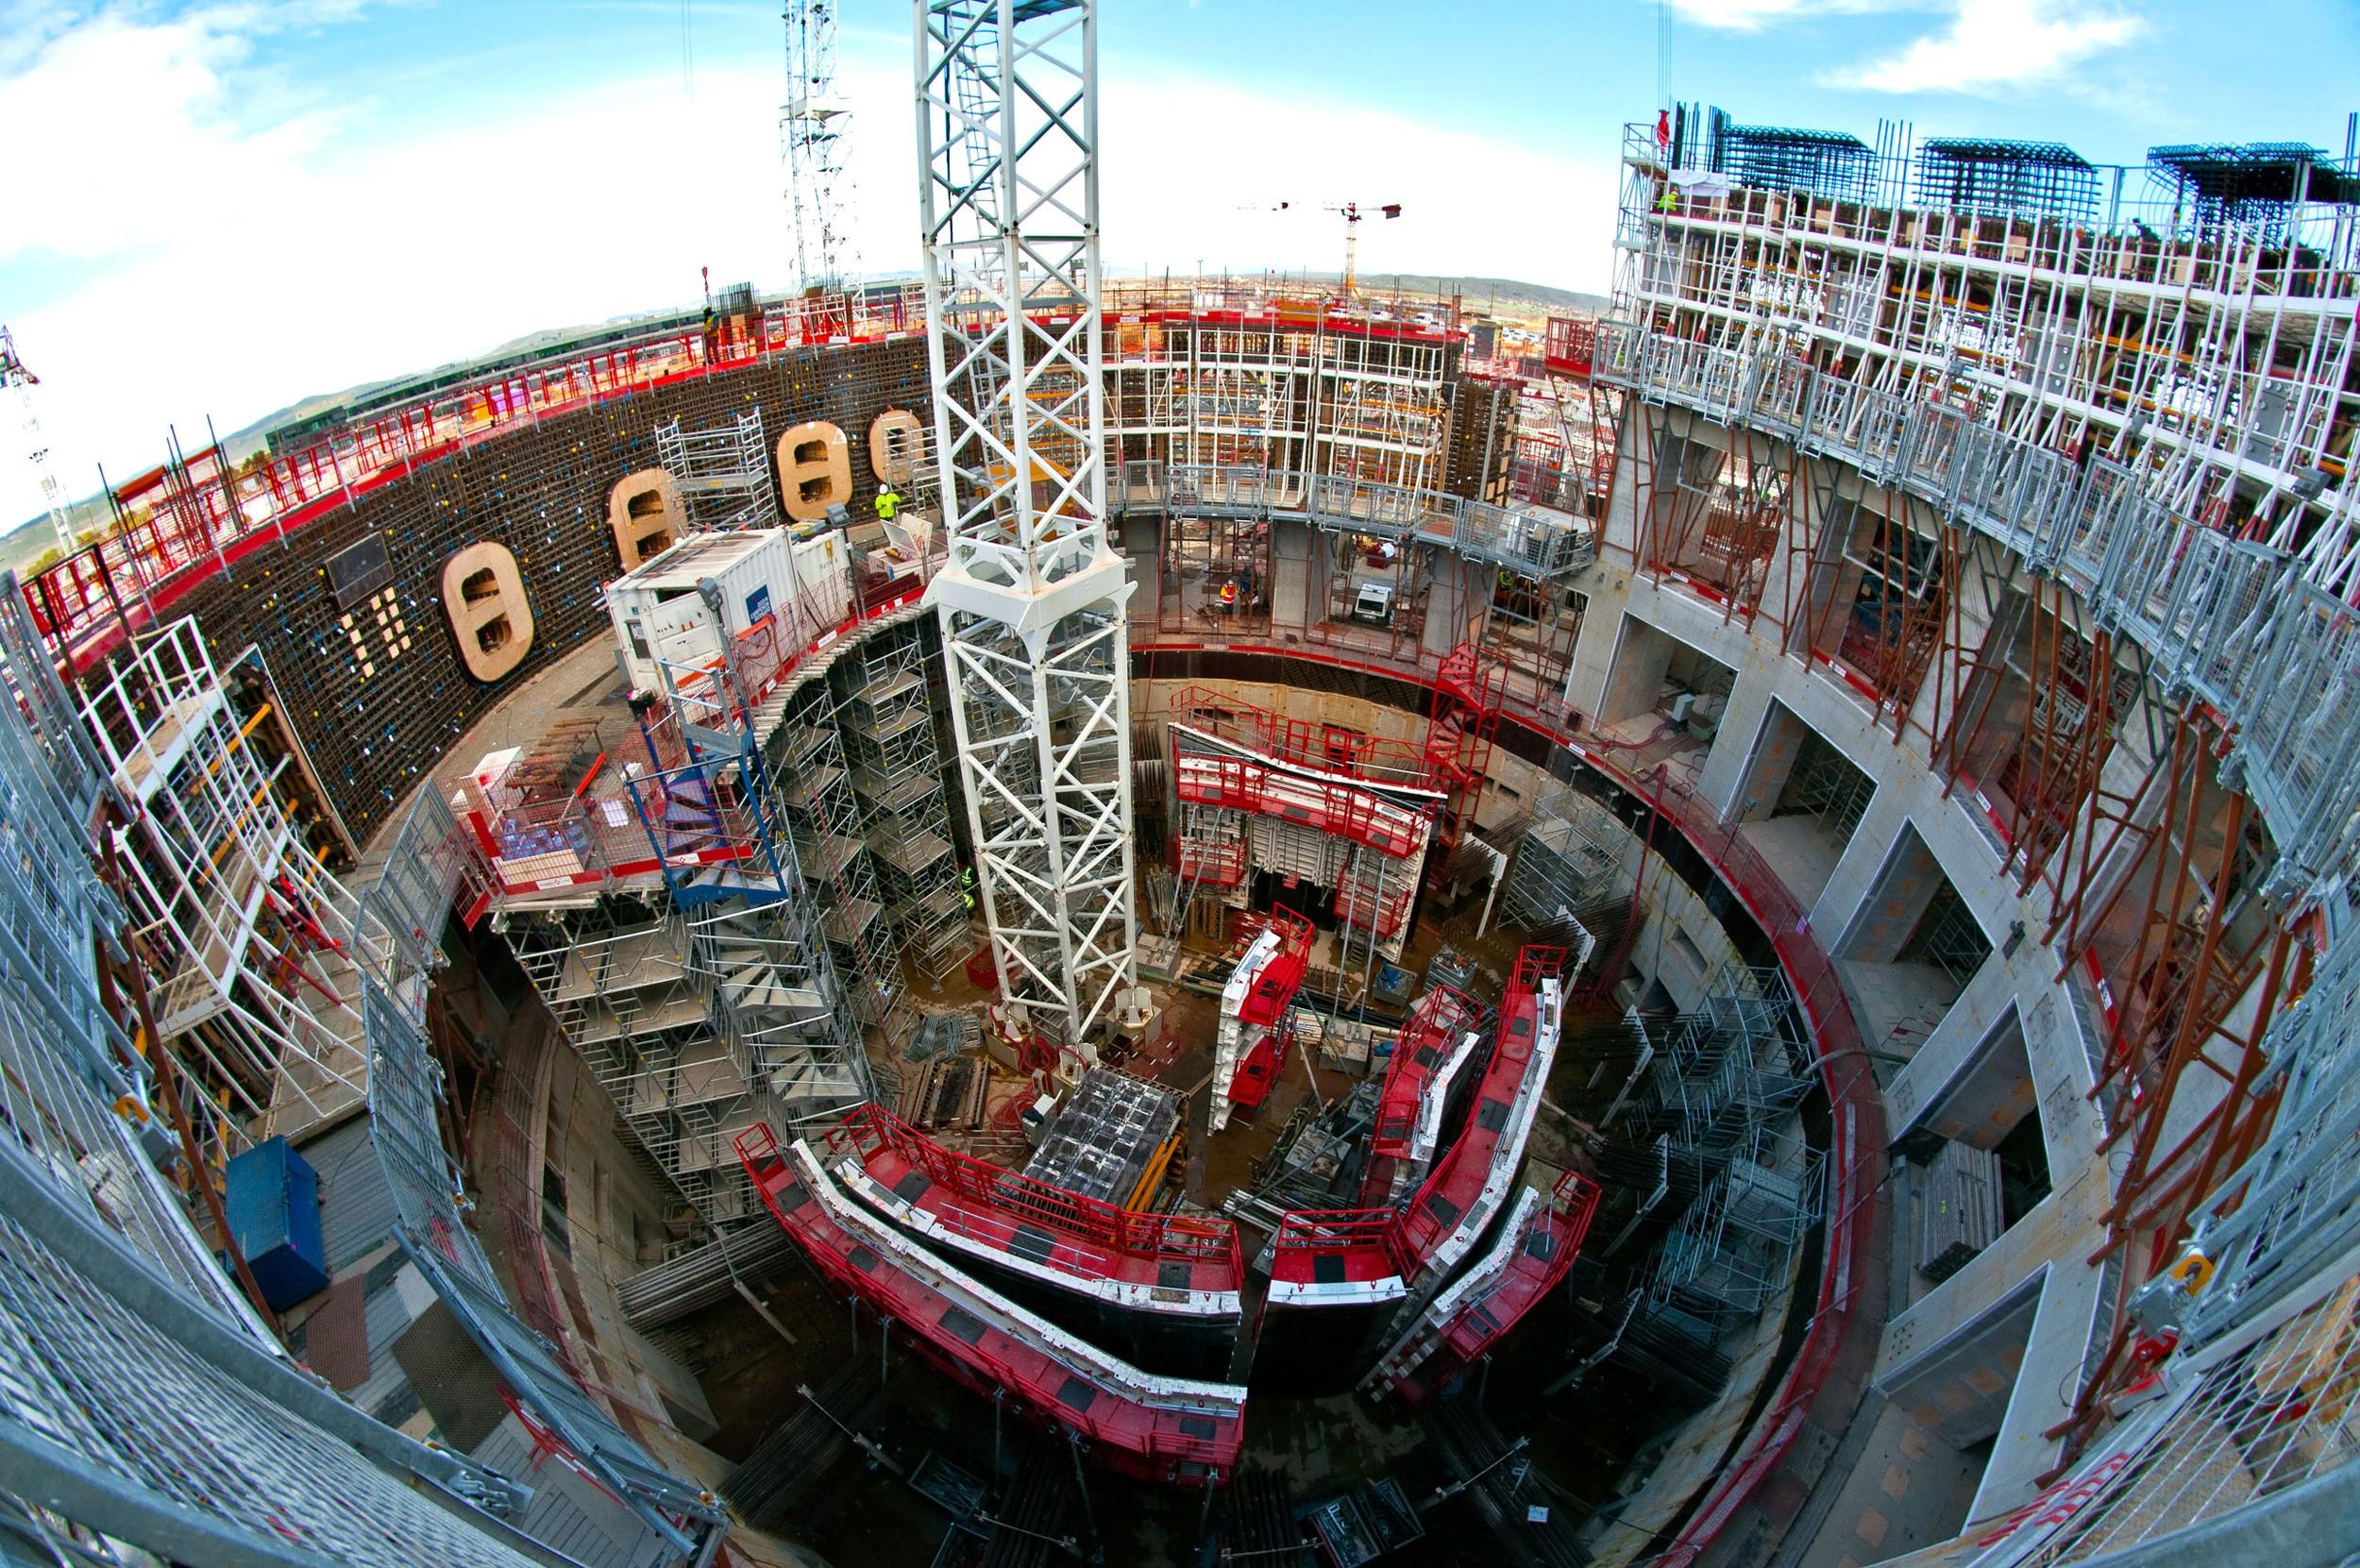 ИТЭР: почти готовая шахта реактора